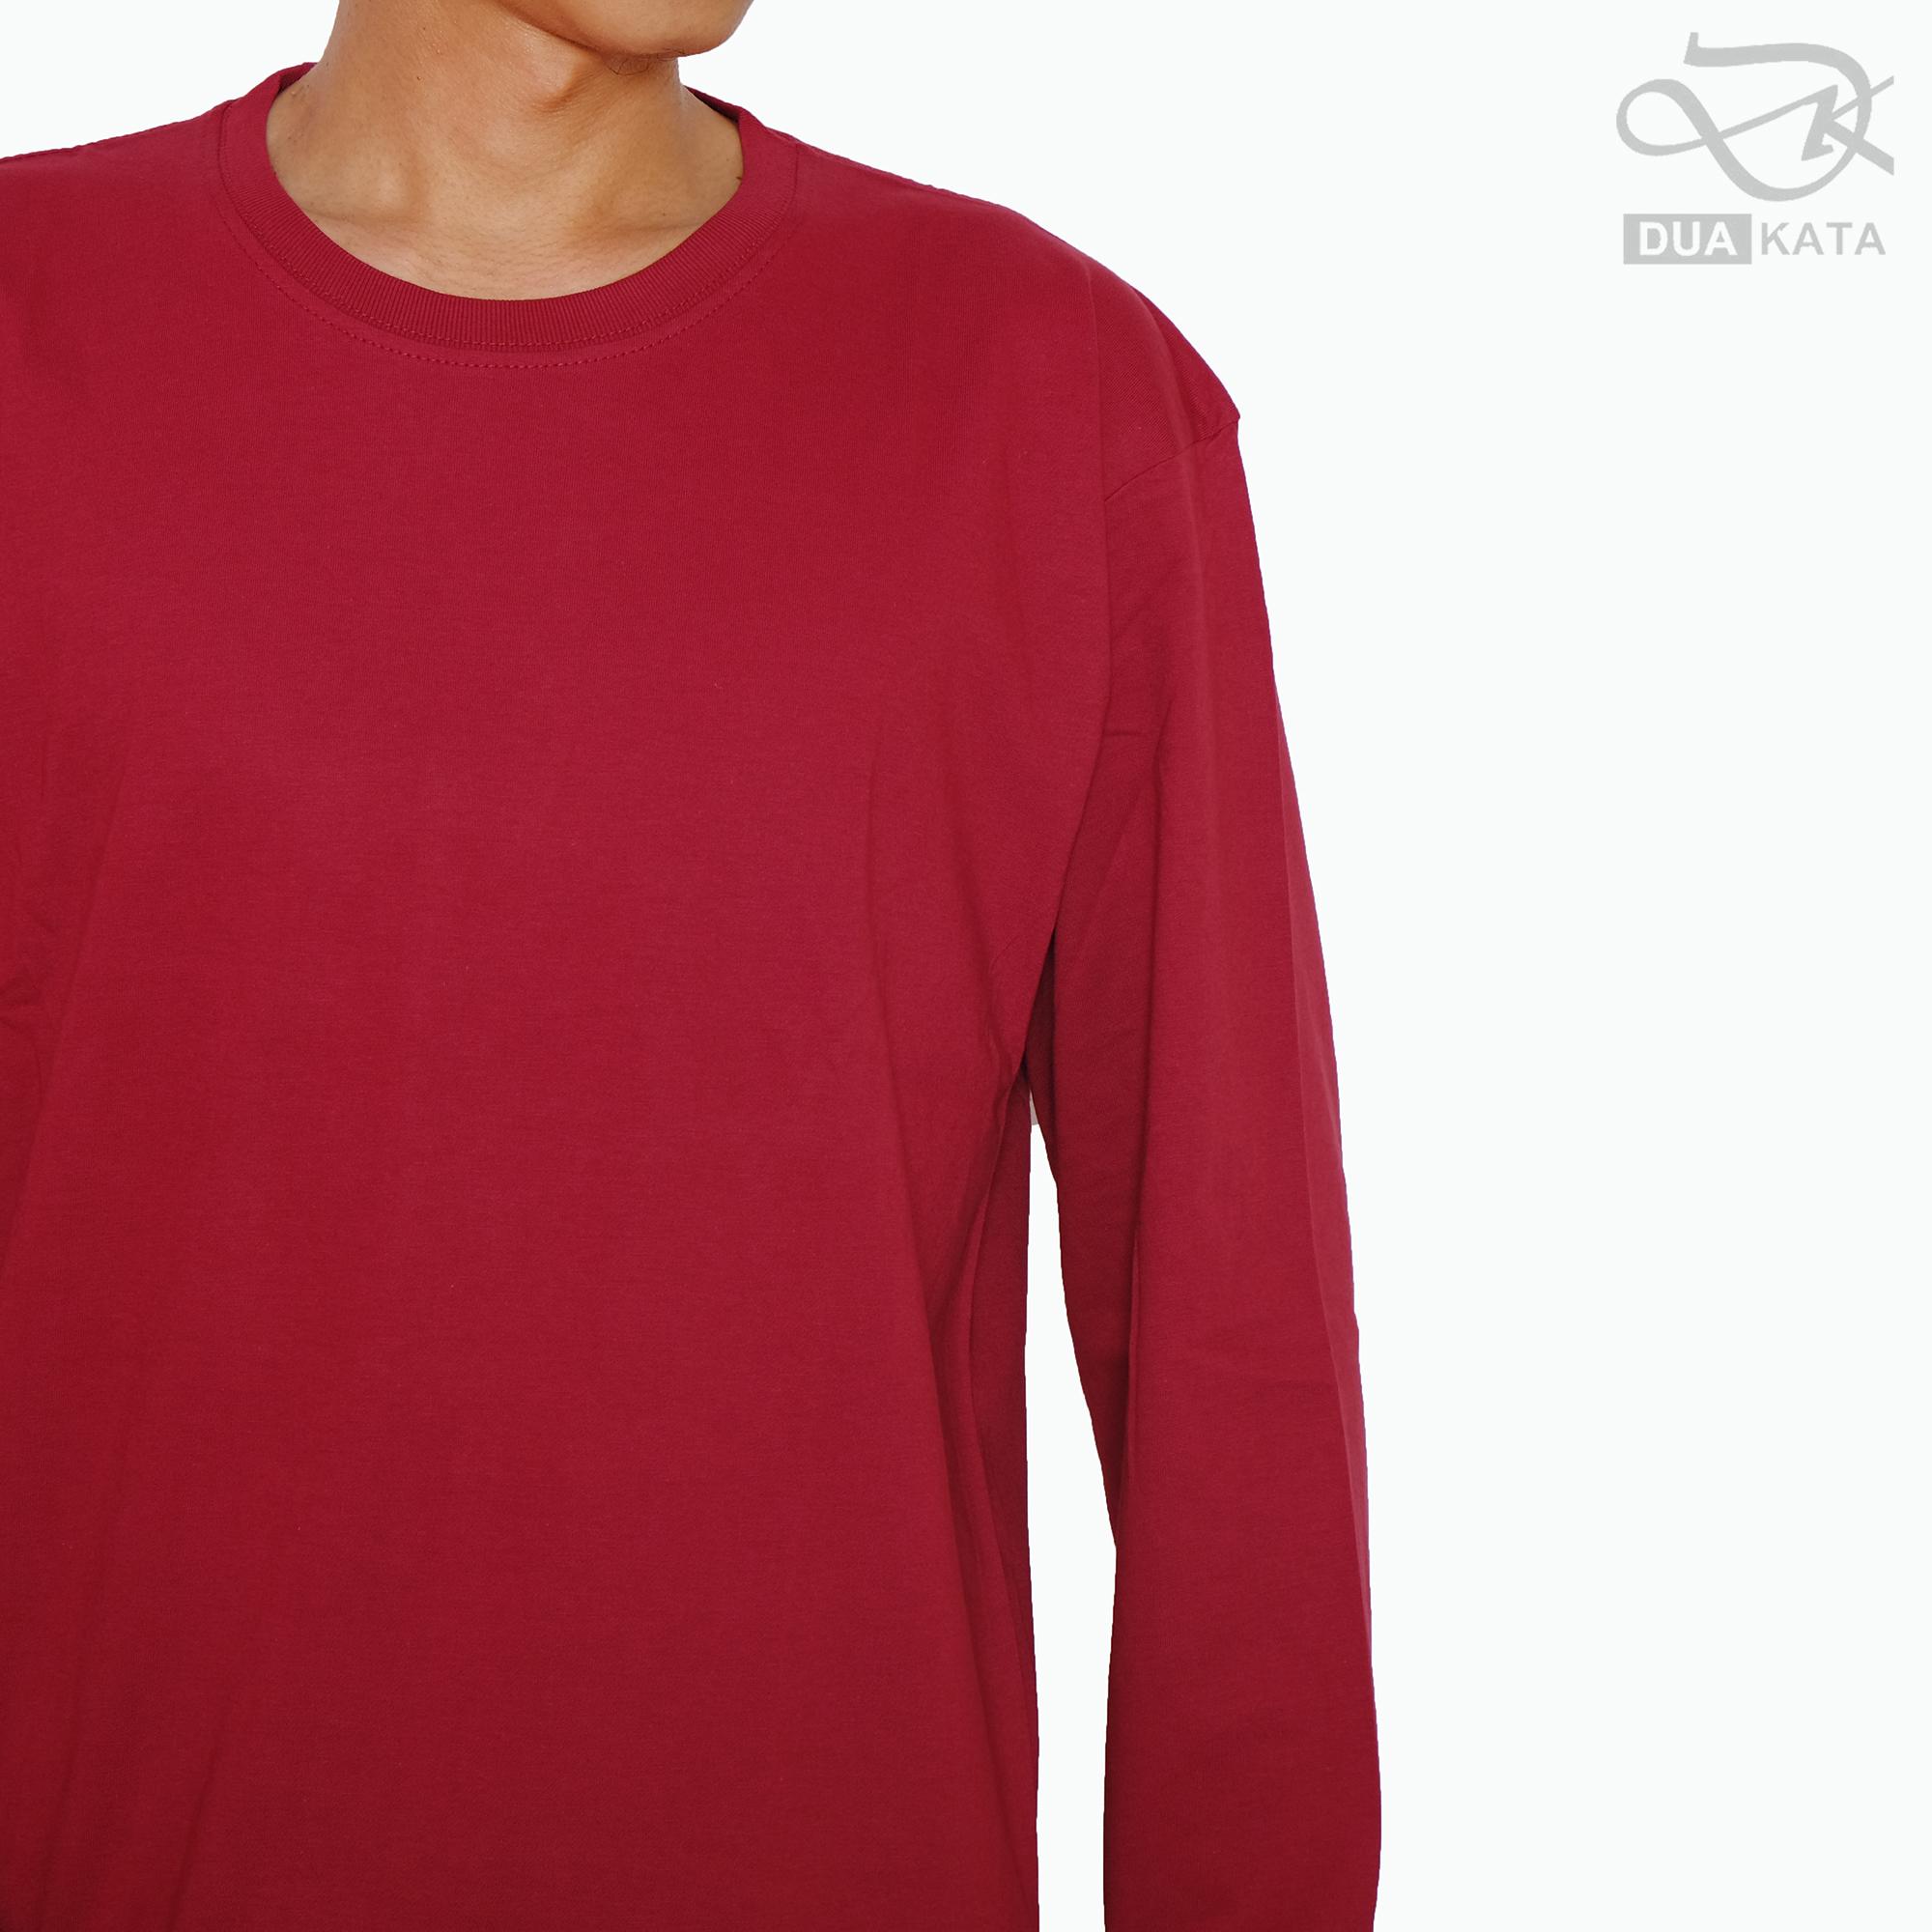 Kaos Polos Maroon Unisex Lengan Panjang Cotton Combed 30s Kaos Pria Dan Wanita Lazada Indonesia